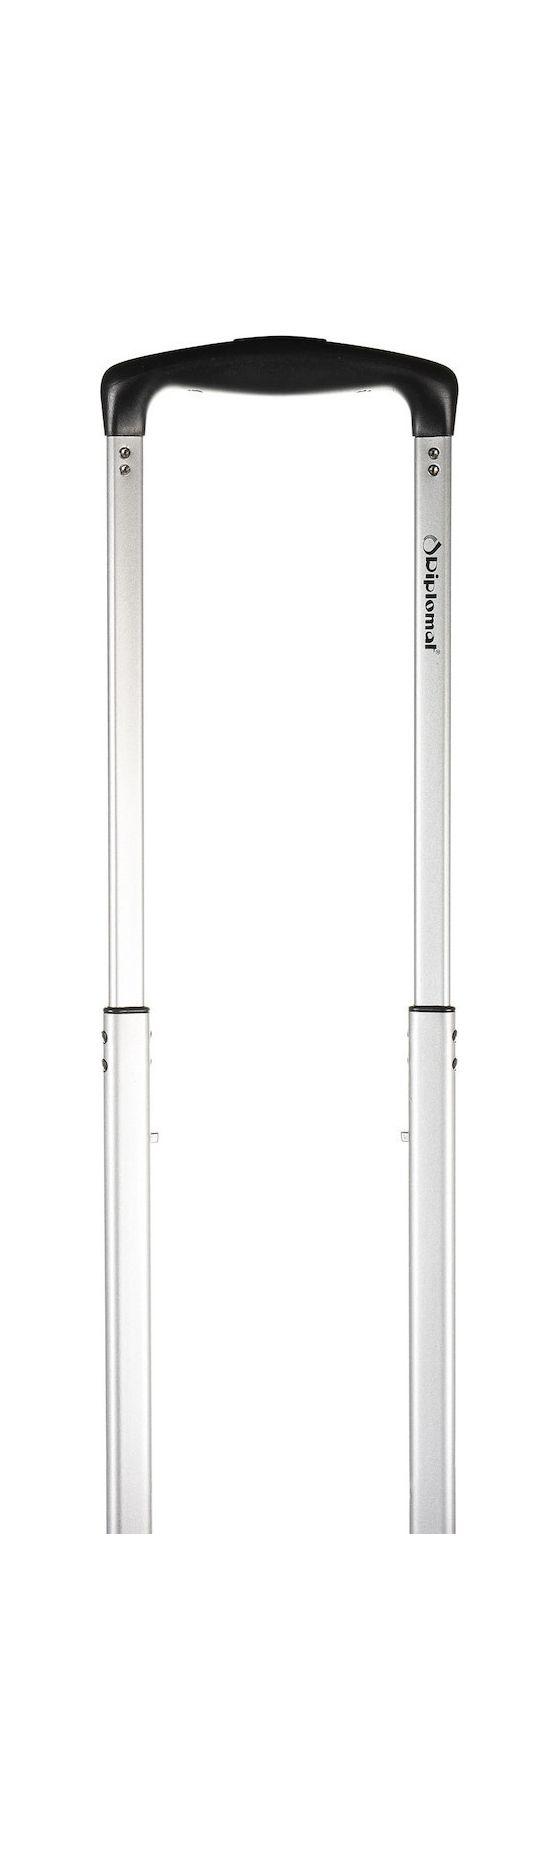 Troler Cabina Poliester 4 Roti DIPLOMAT ZC 614 - 54 cm